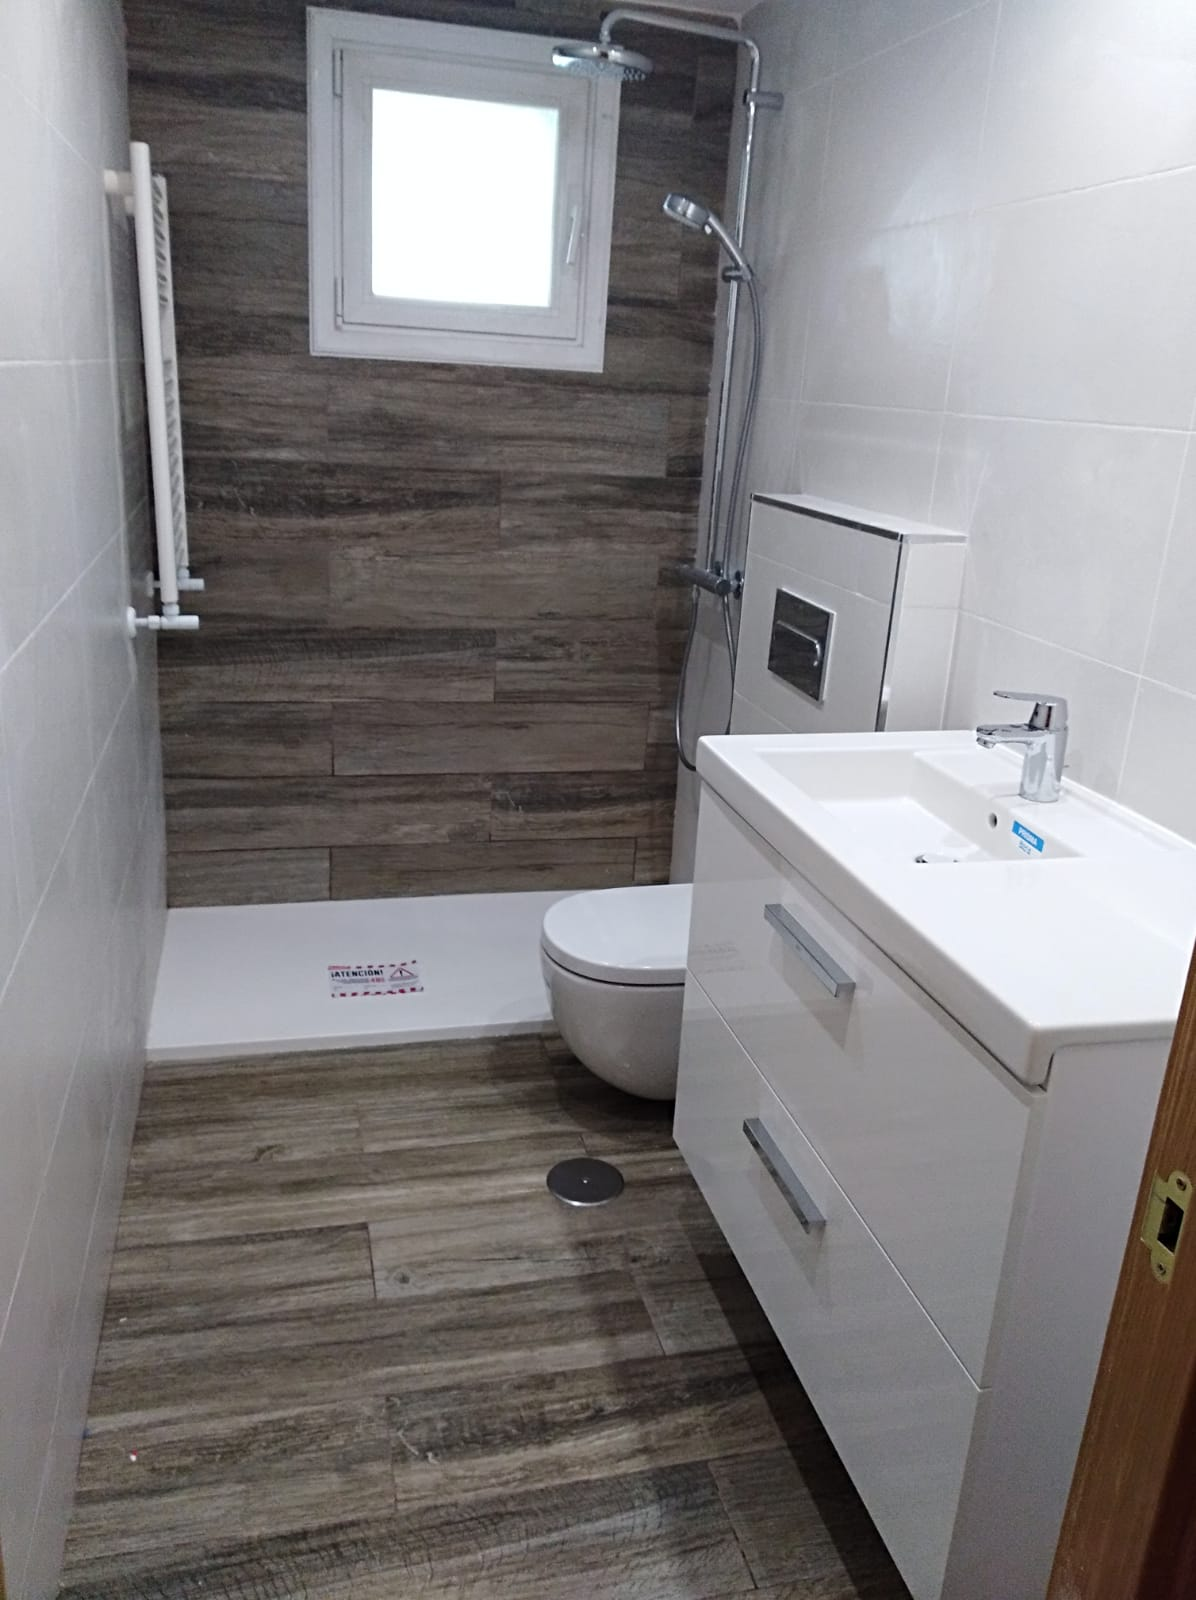 Azulejos imitacion madera. Baños imitacion madera.